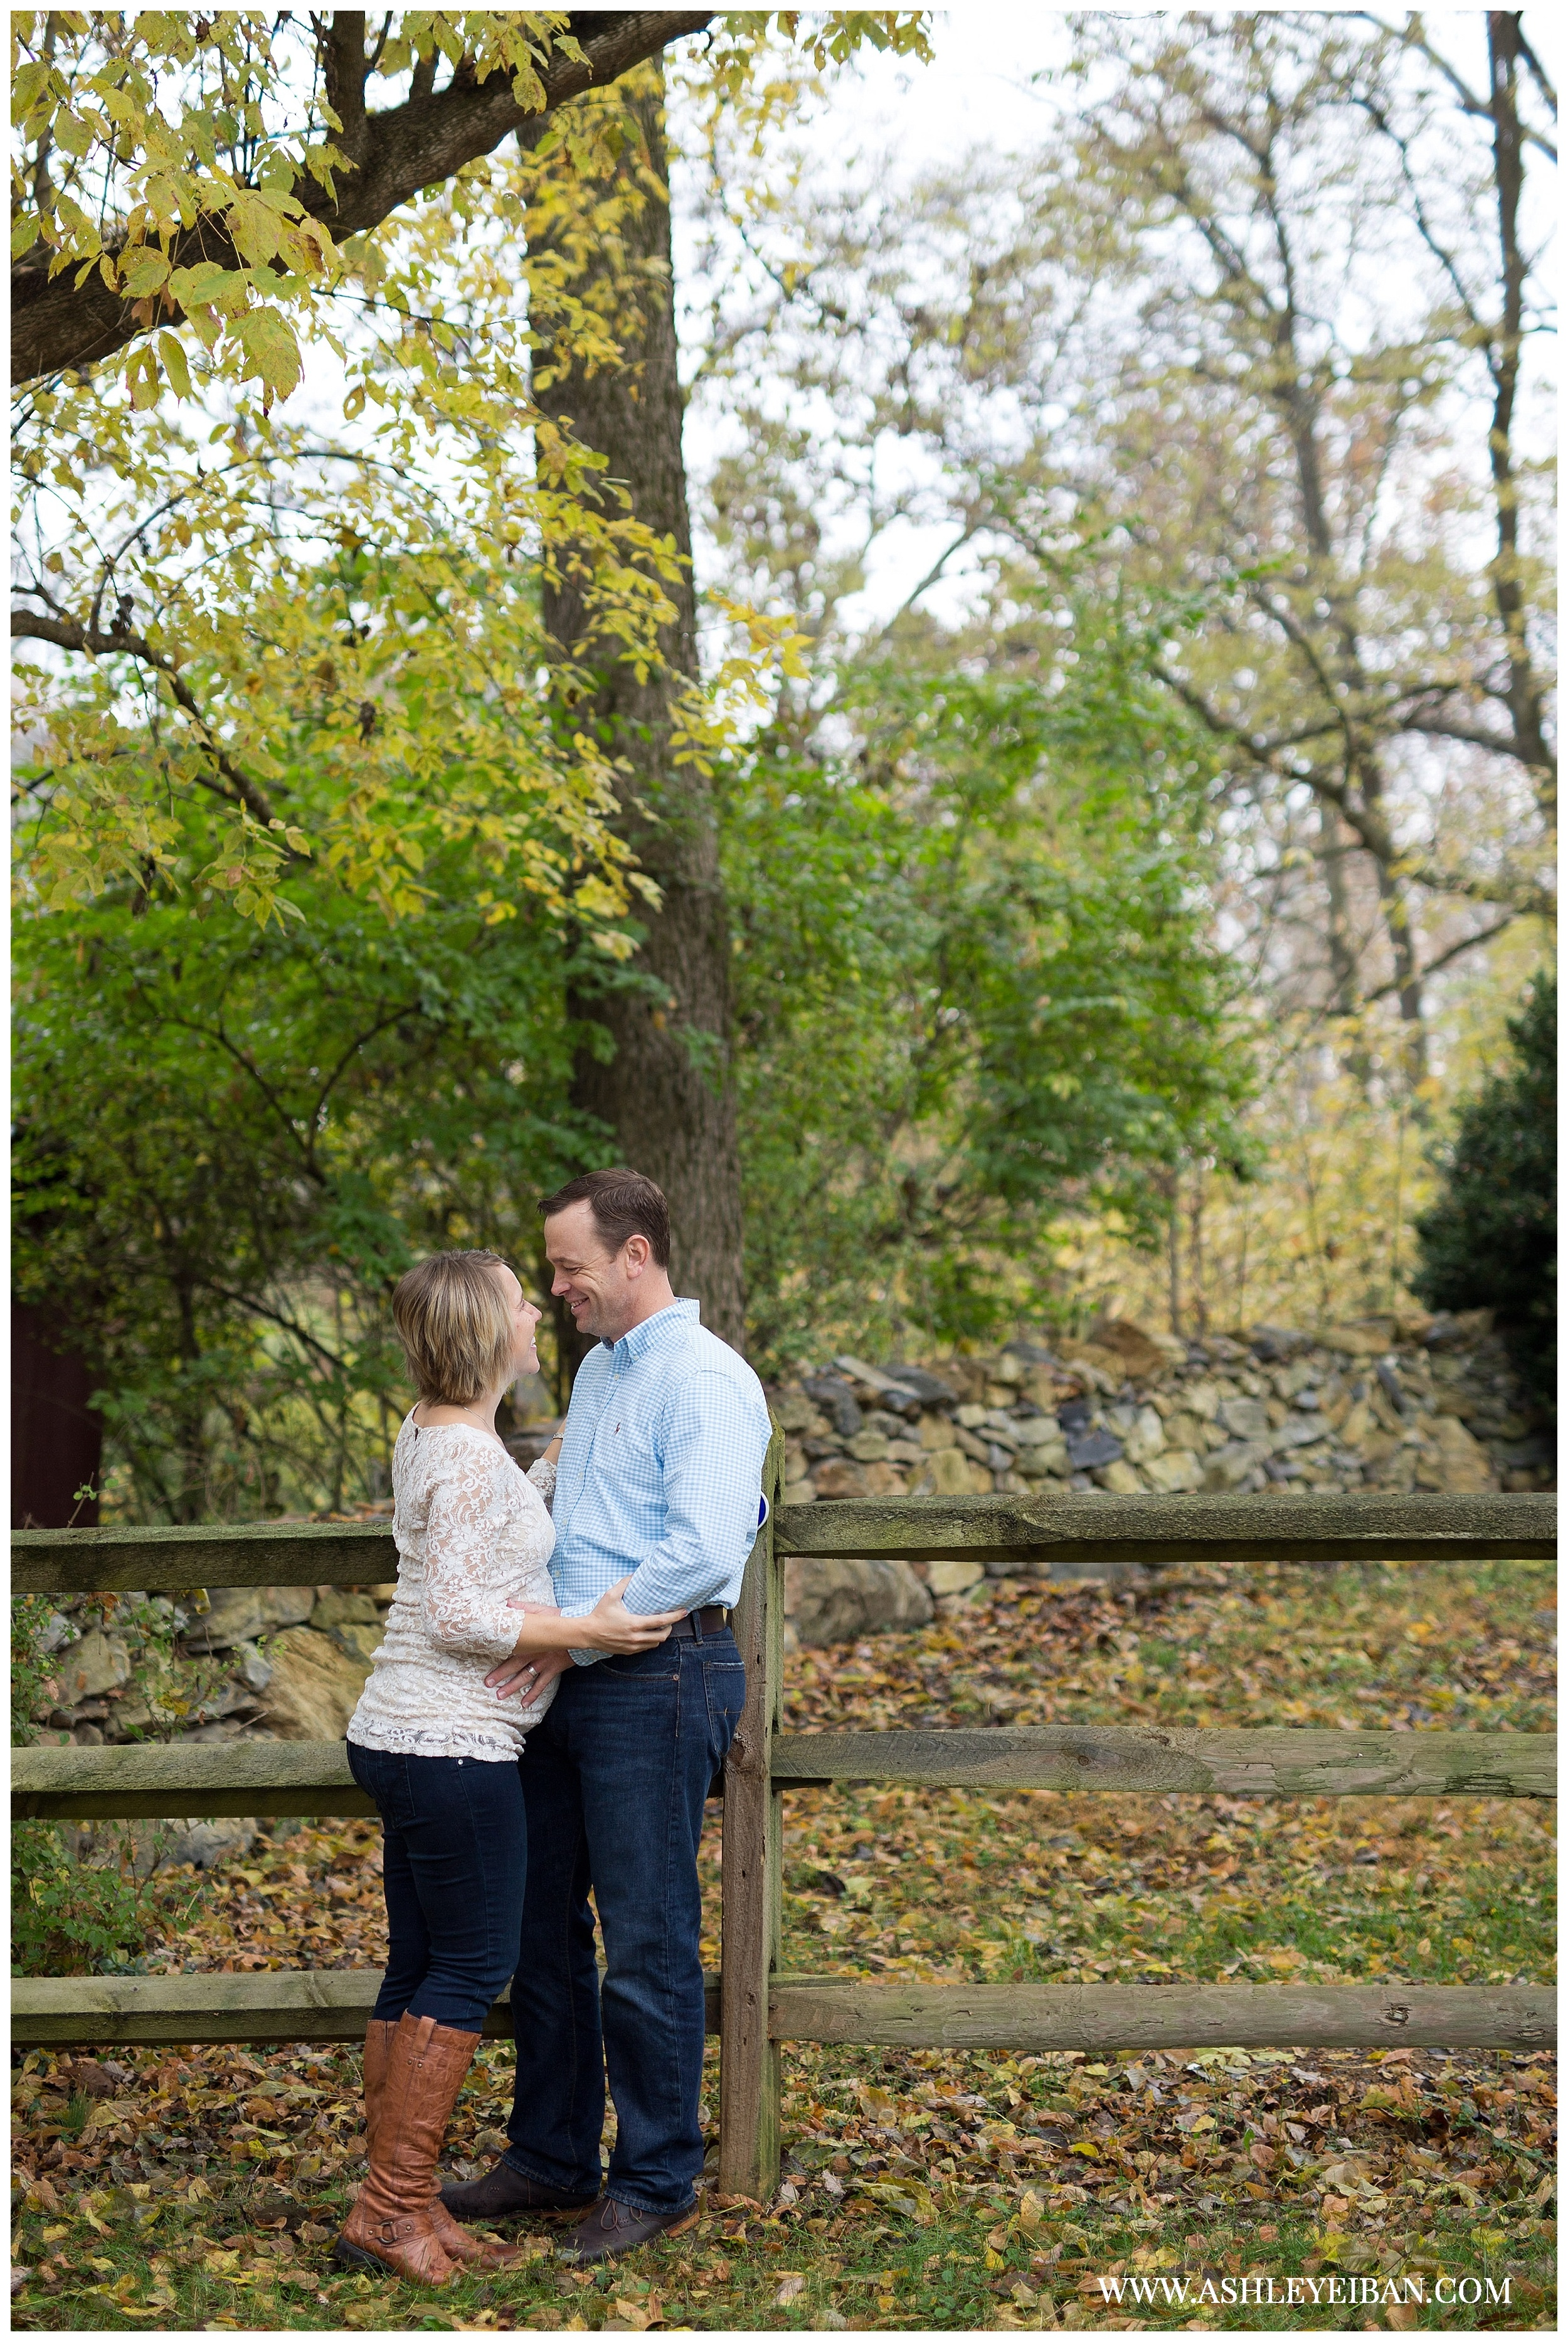 Winchester VA Wedding and Portrait Photographer || Lynchburg, VA Maternity Photographer || Fall Maternity Photos || Ashley Eiban Photography || www.ashleyeiban.com